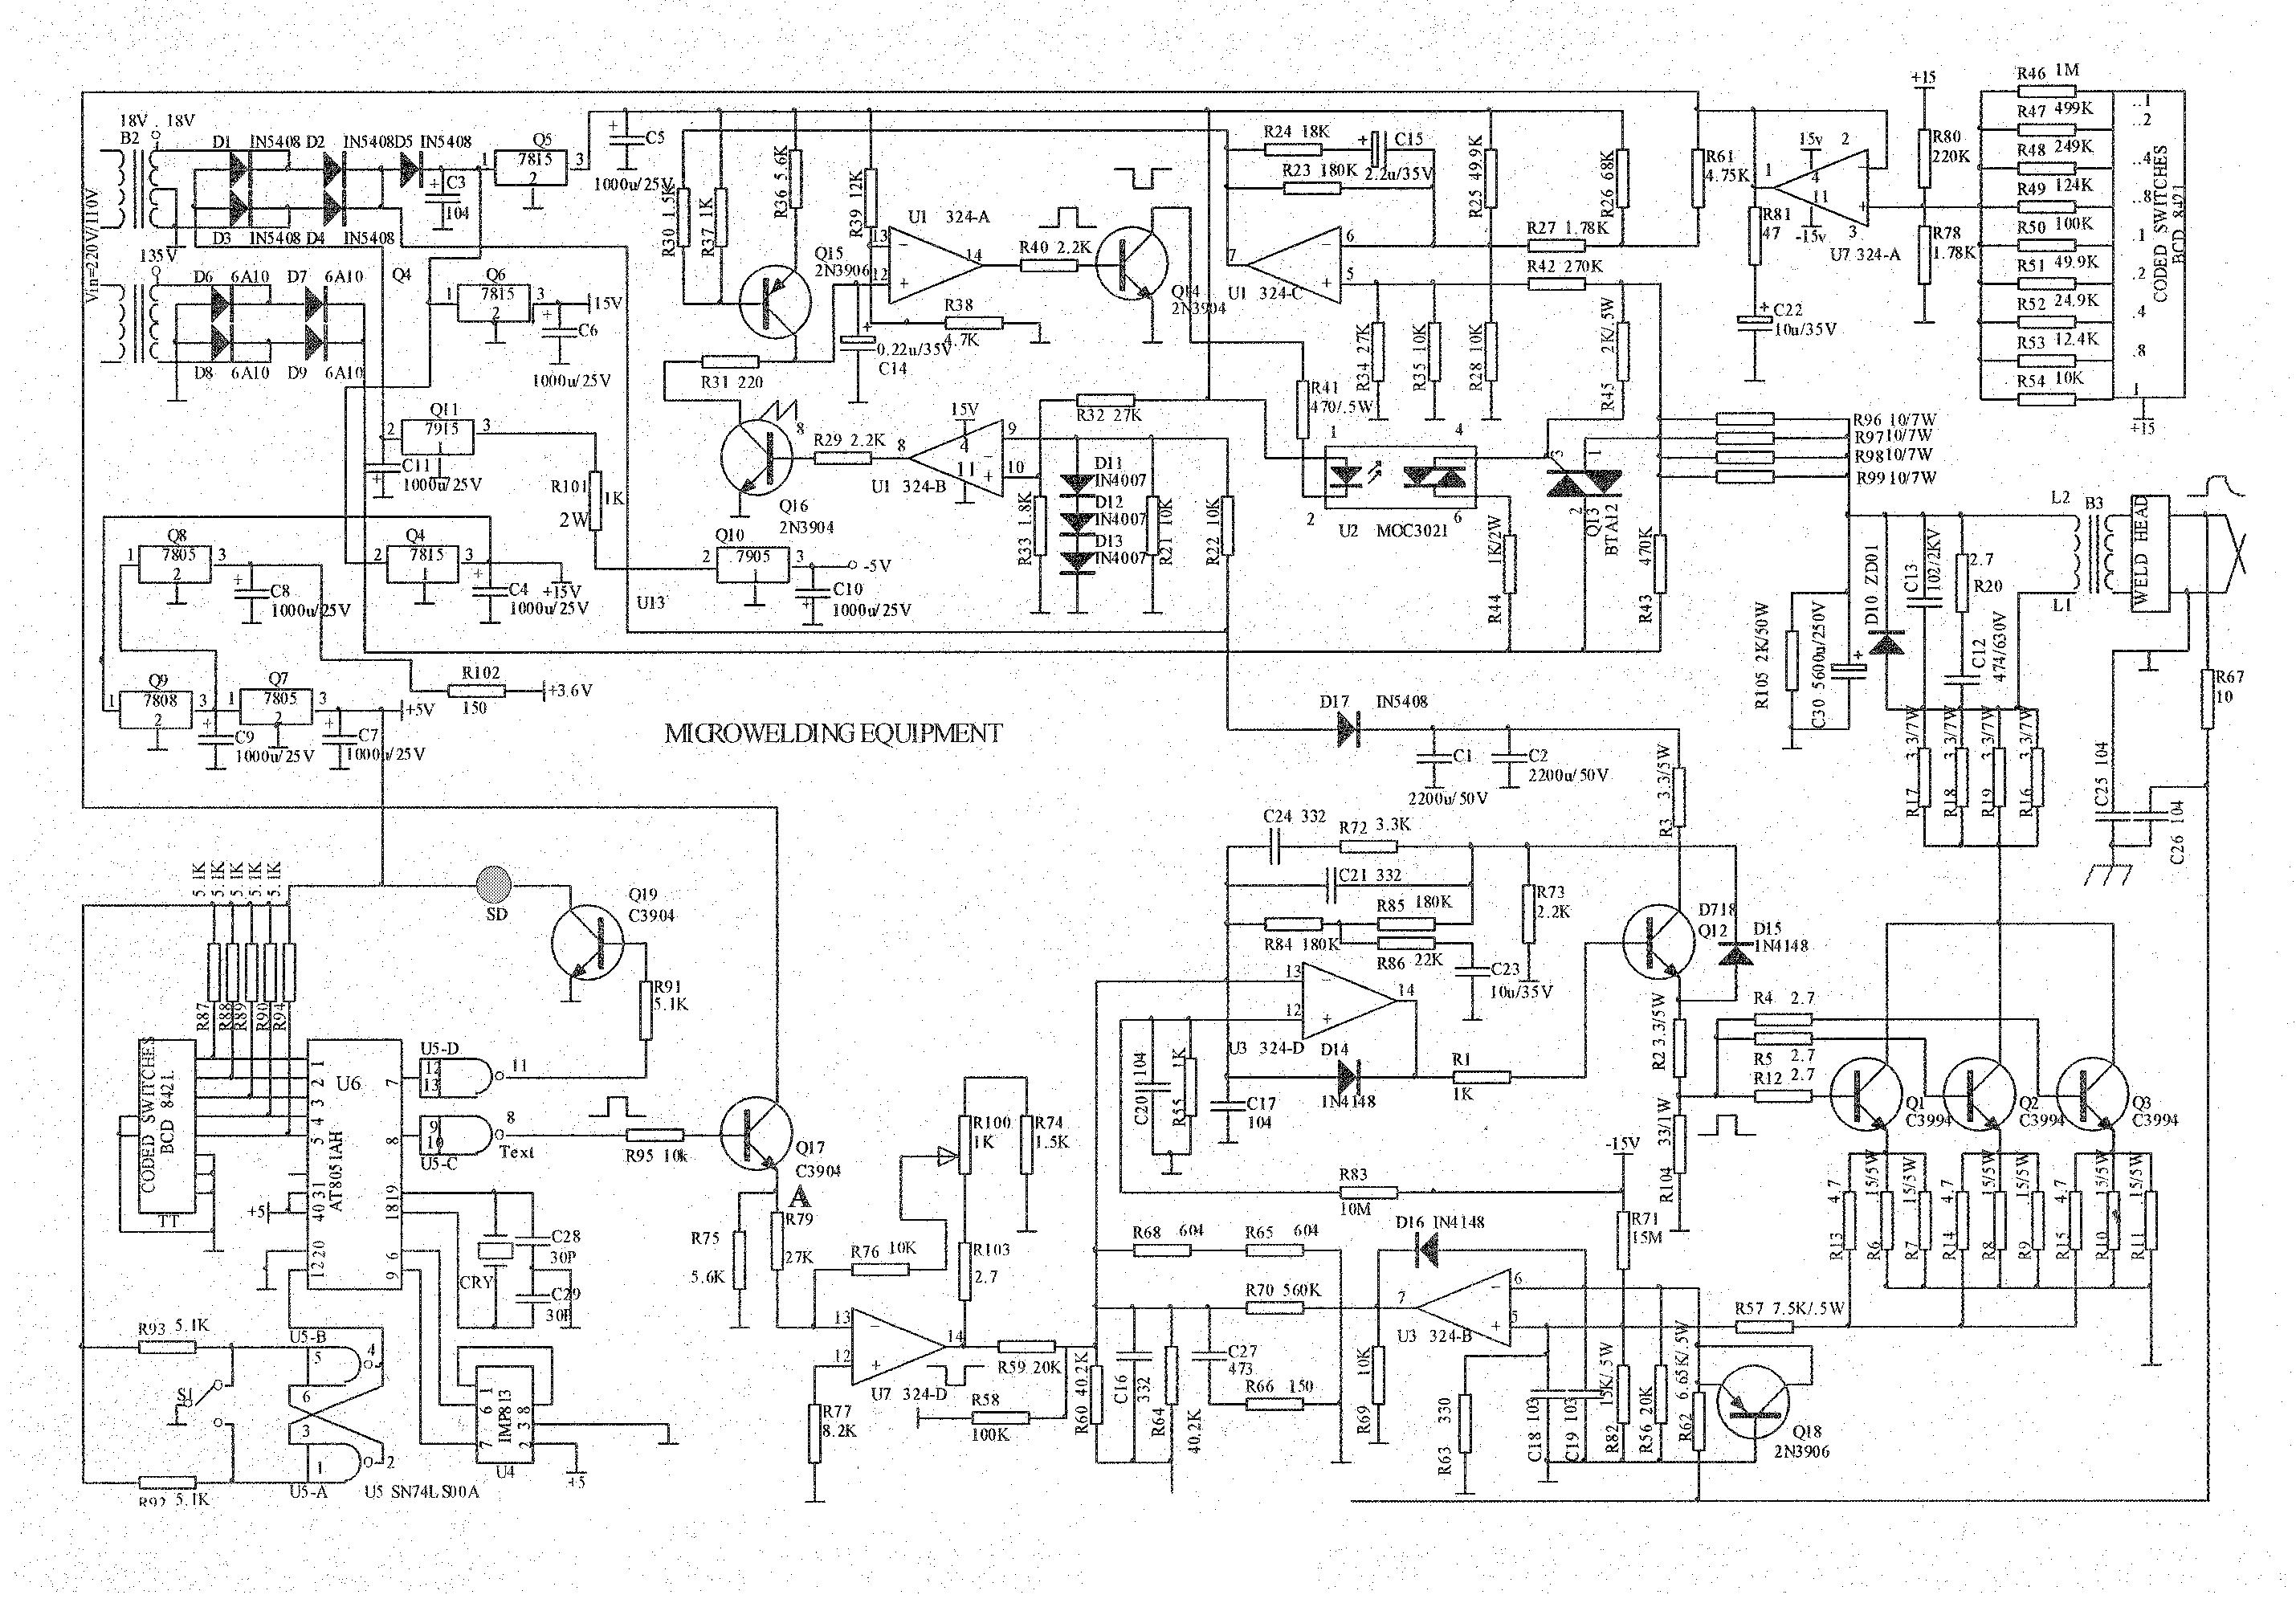 Brazing Torch Diagram Modern Design Of Wiring Welding Welder Equipment 24 Images With Acetylene Mapp Gas